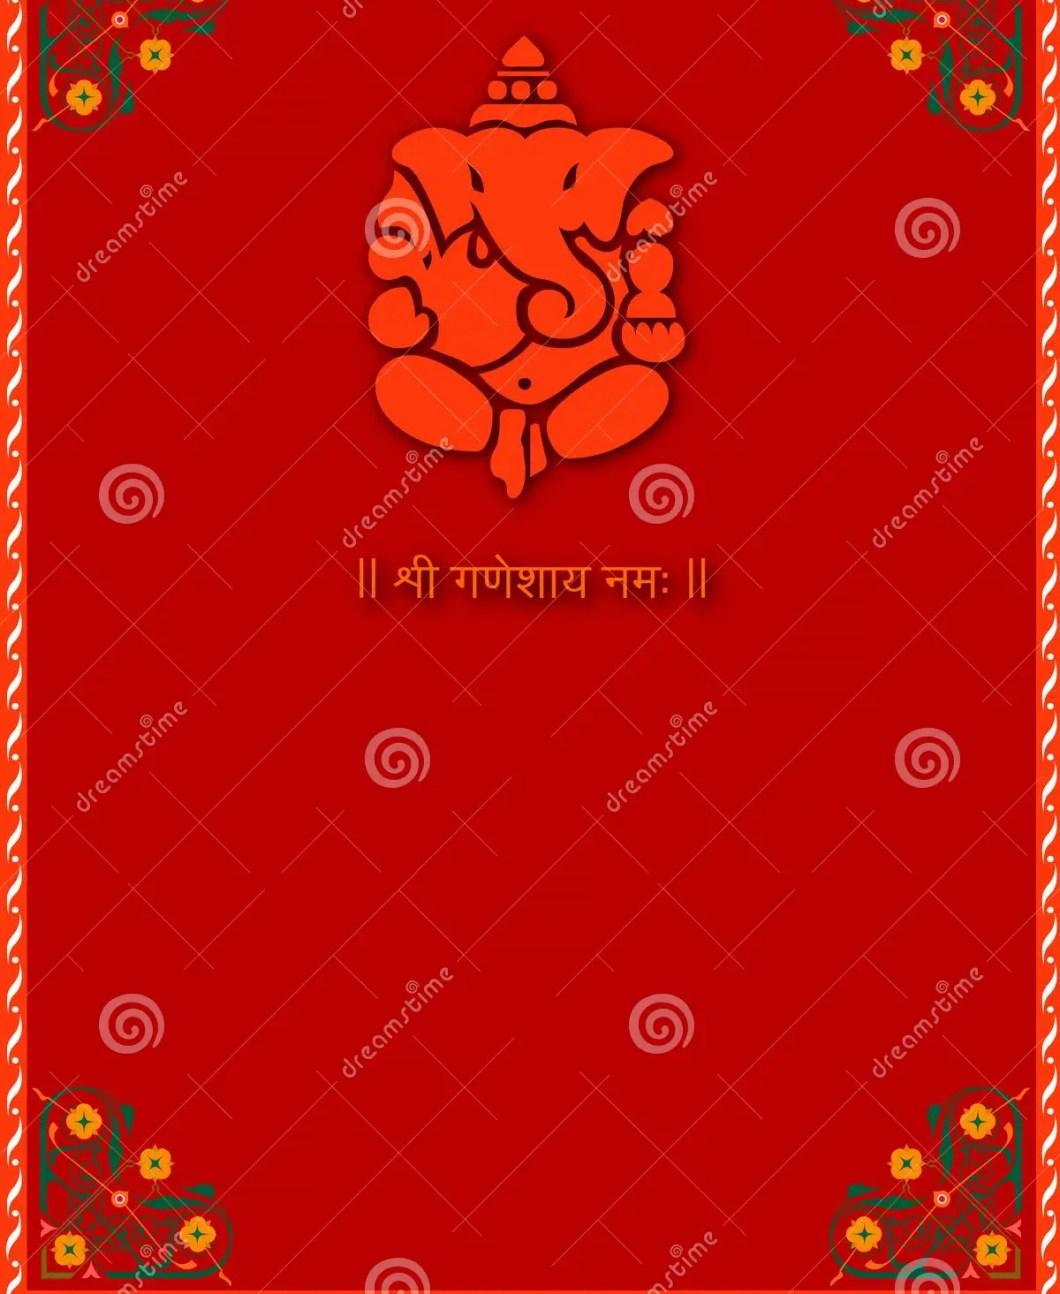 ganpati invitation card in marathi | Rezzasite.co